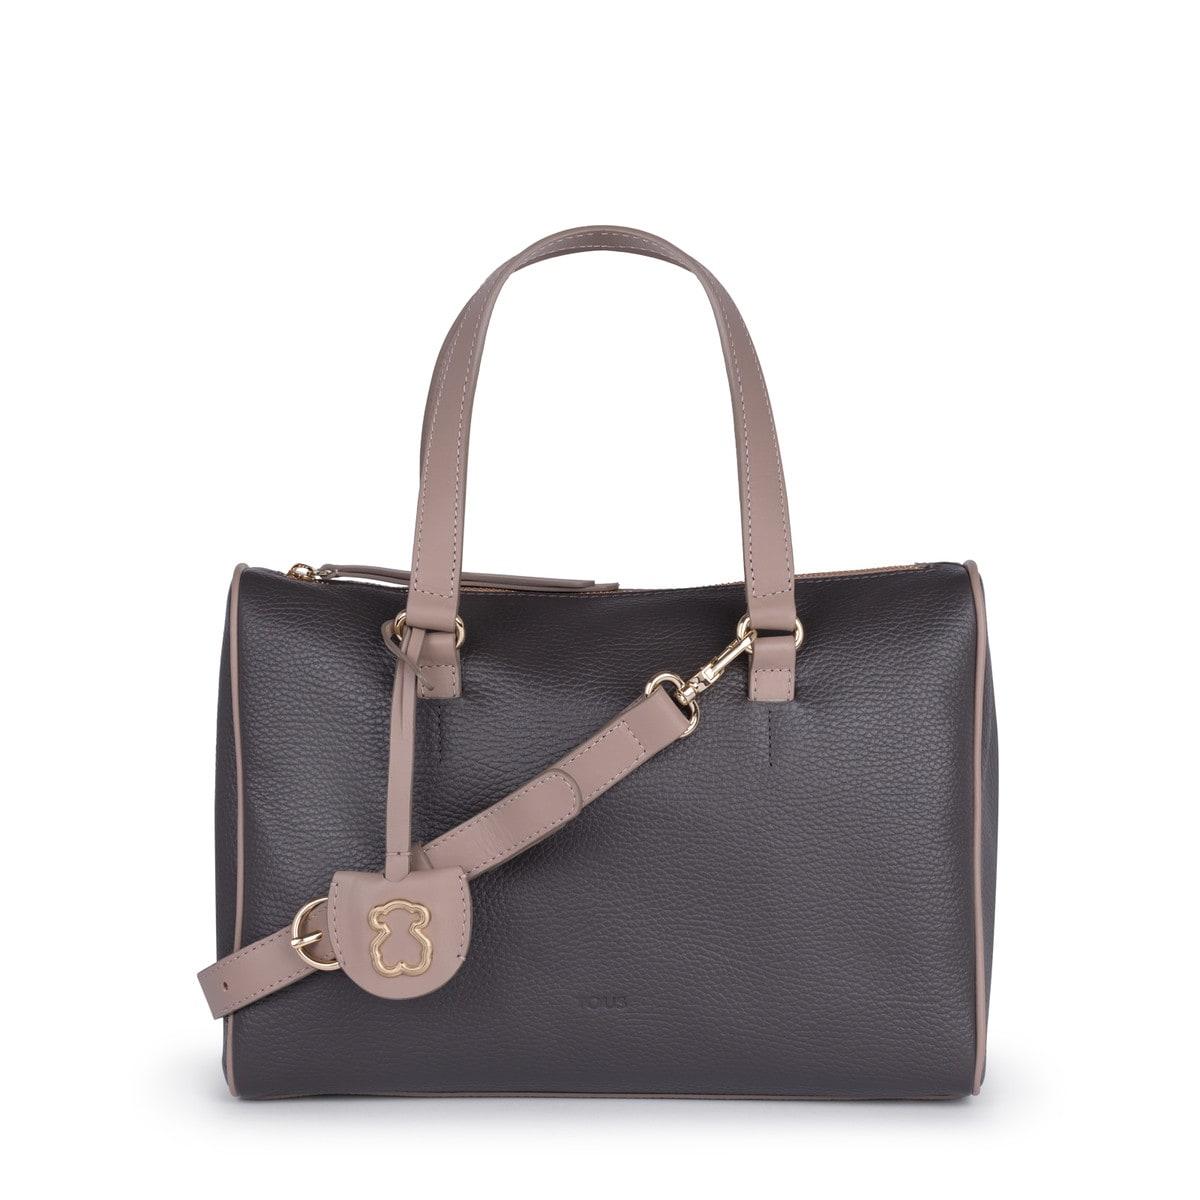 7d2115651c Τσάντα τύπου μπόουλινγκ Arisa από Δέρμα σε χρώμα γκρι-μπεζ - Tous ...